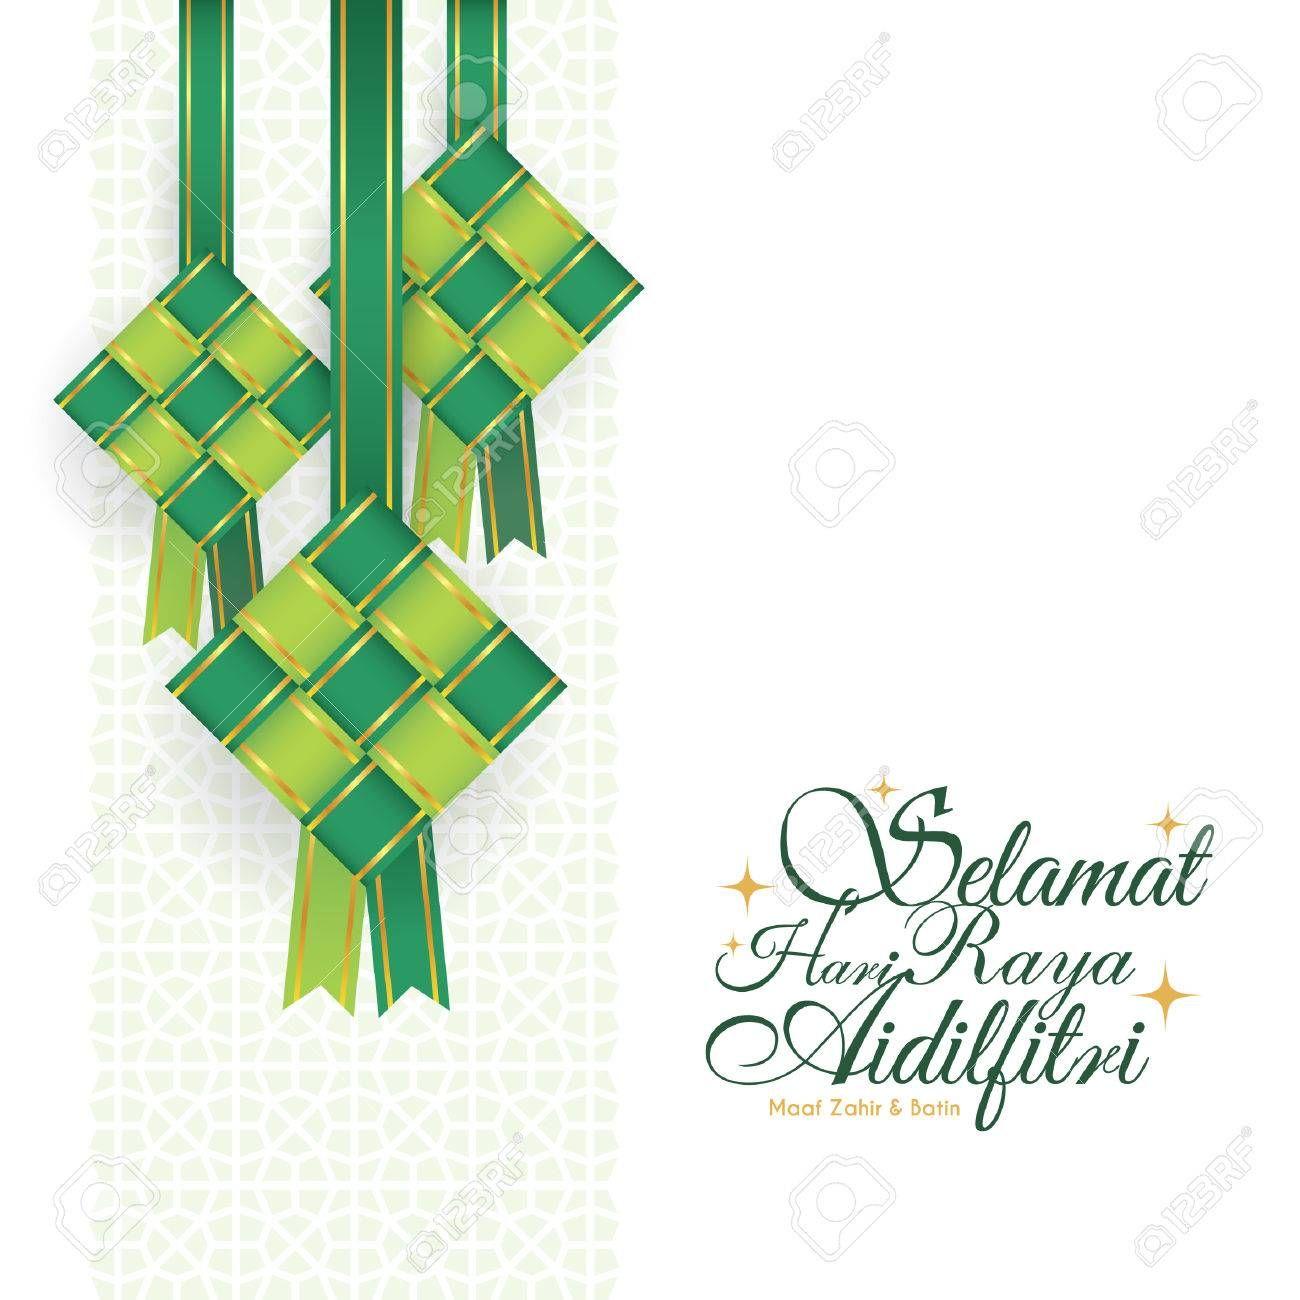 Hasil Carian Imej Untuk Ketupat Hari Raya Aidilfitri Greeting Card Design Eid Card Designs Greeting Card Template